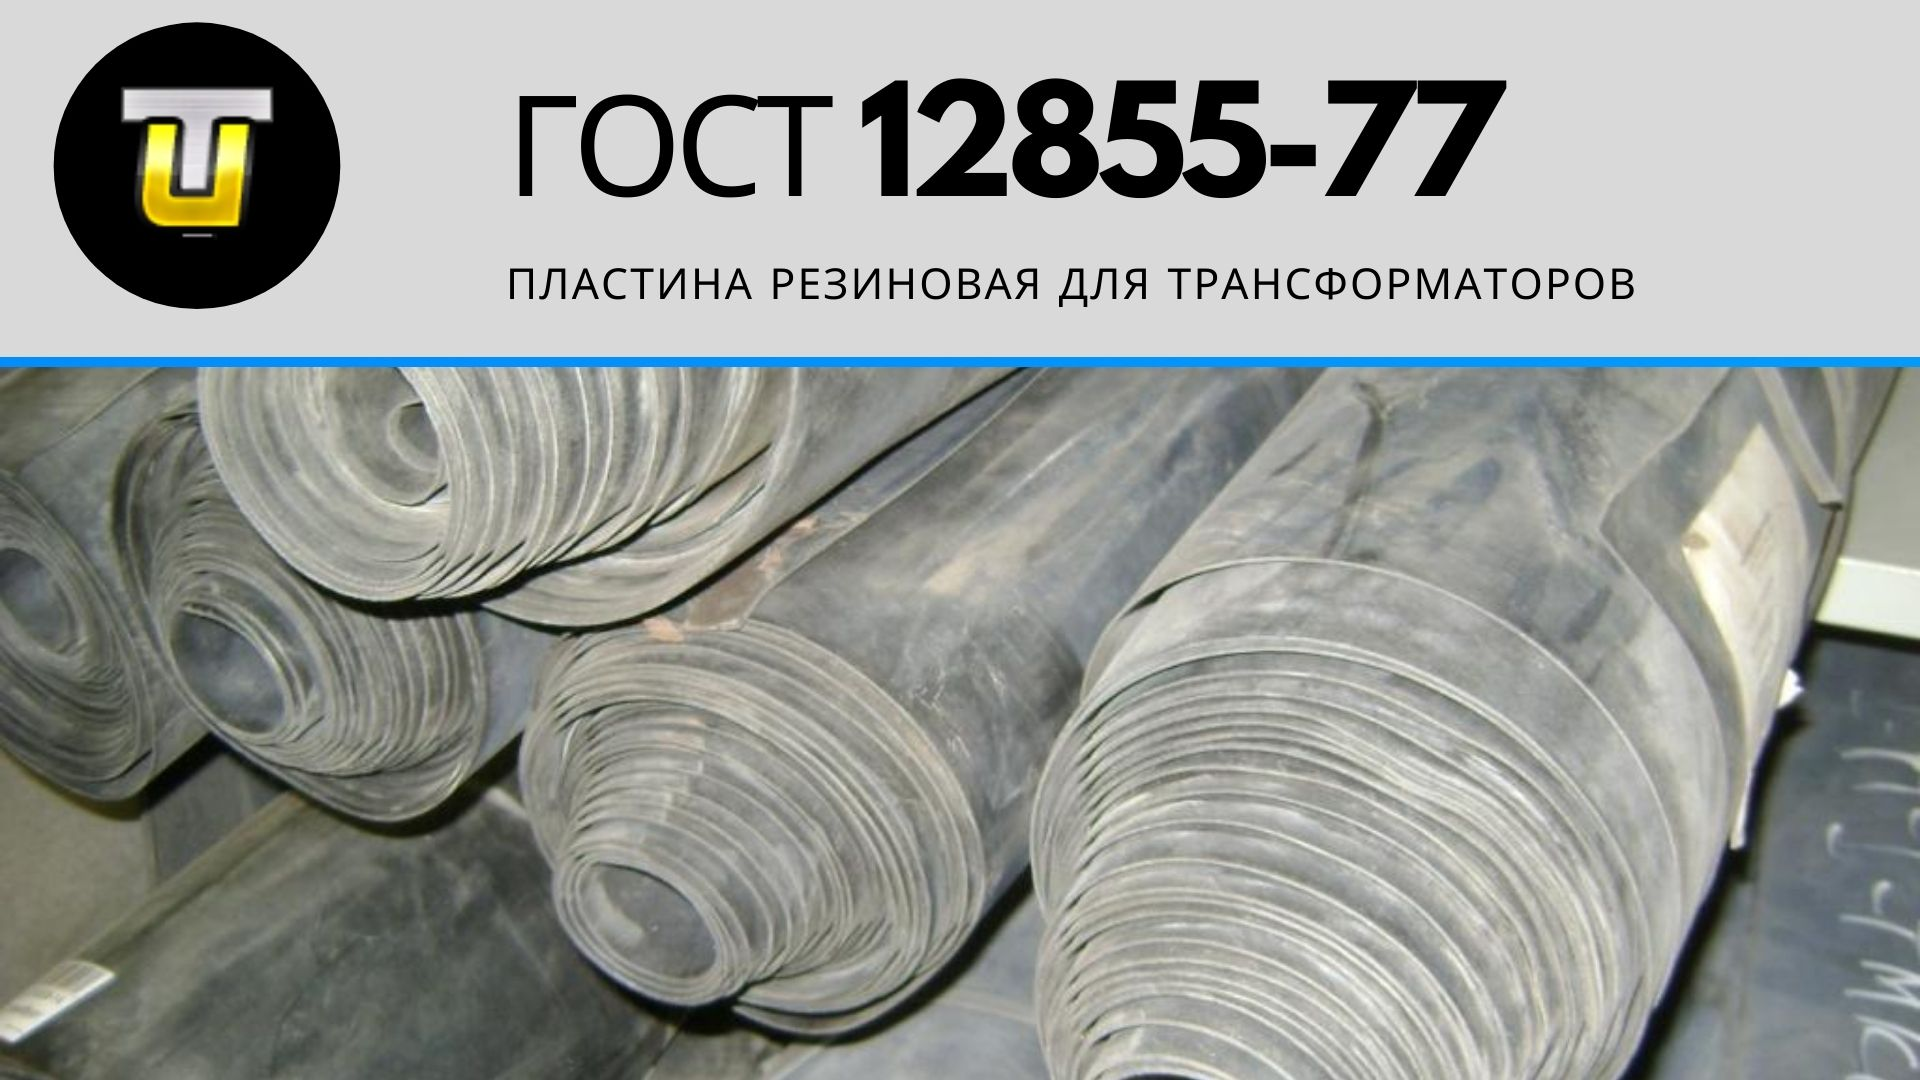 ГОСТ 12855-77